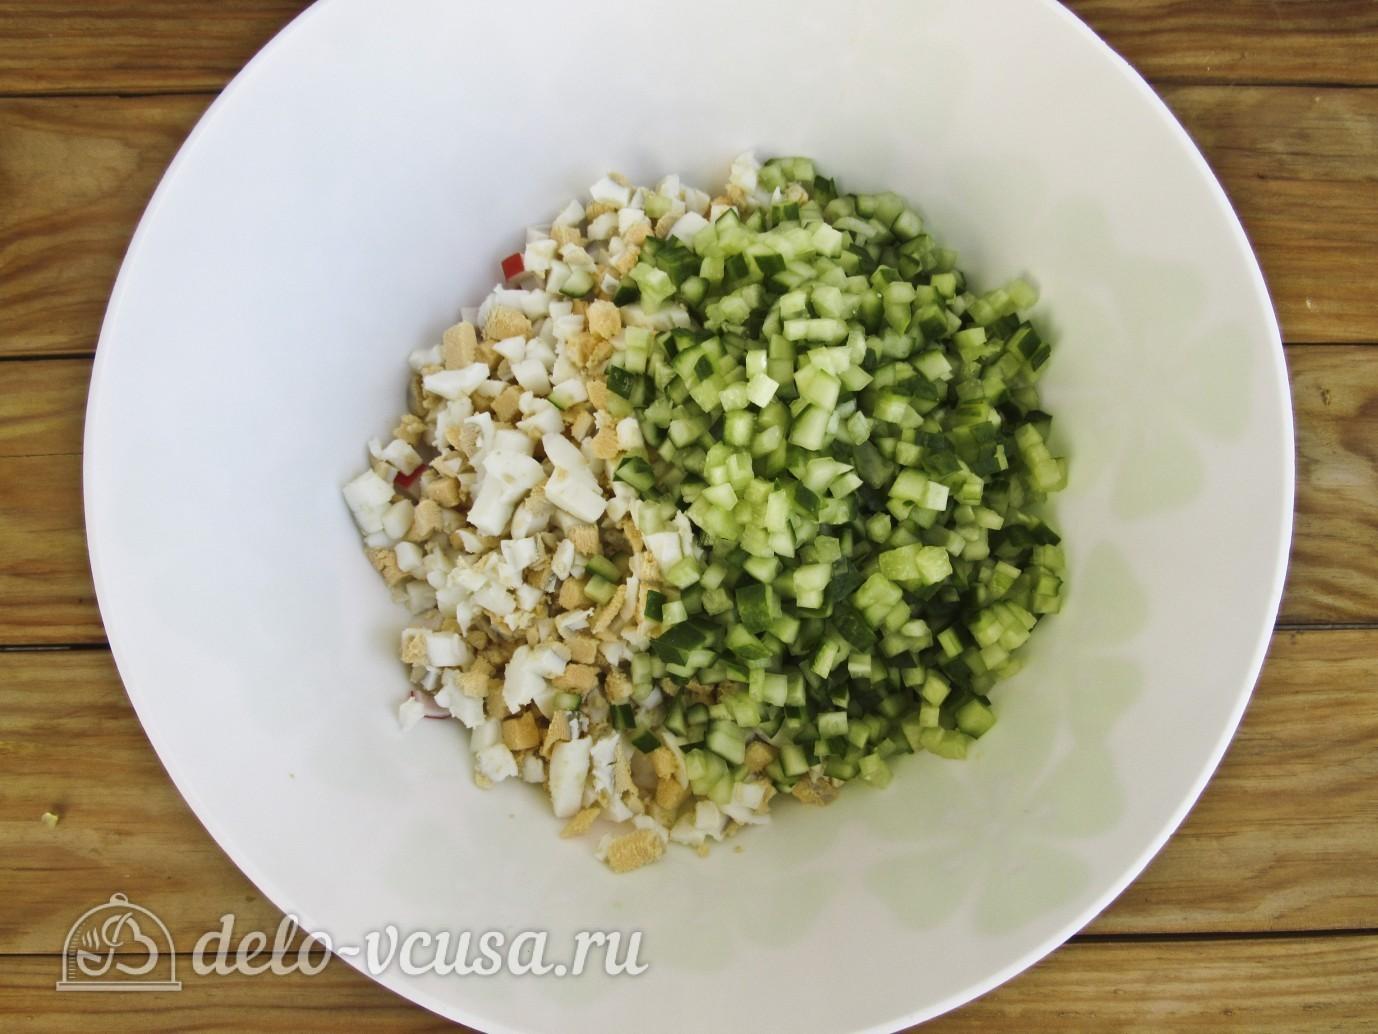 салат аппетитный рецепт с огурцом